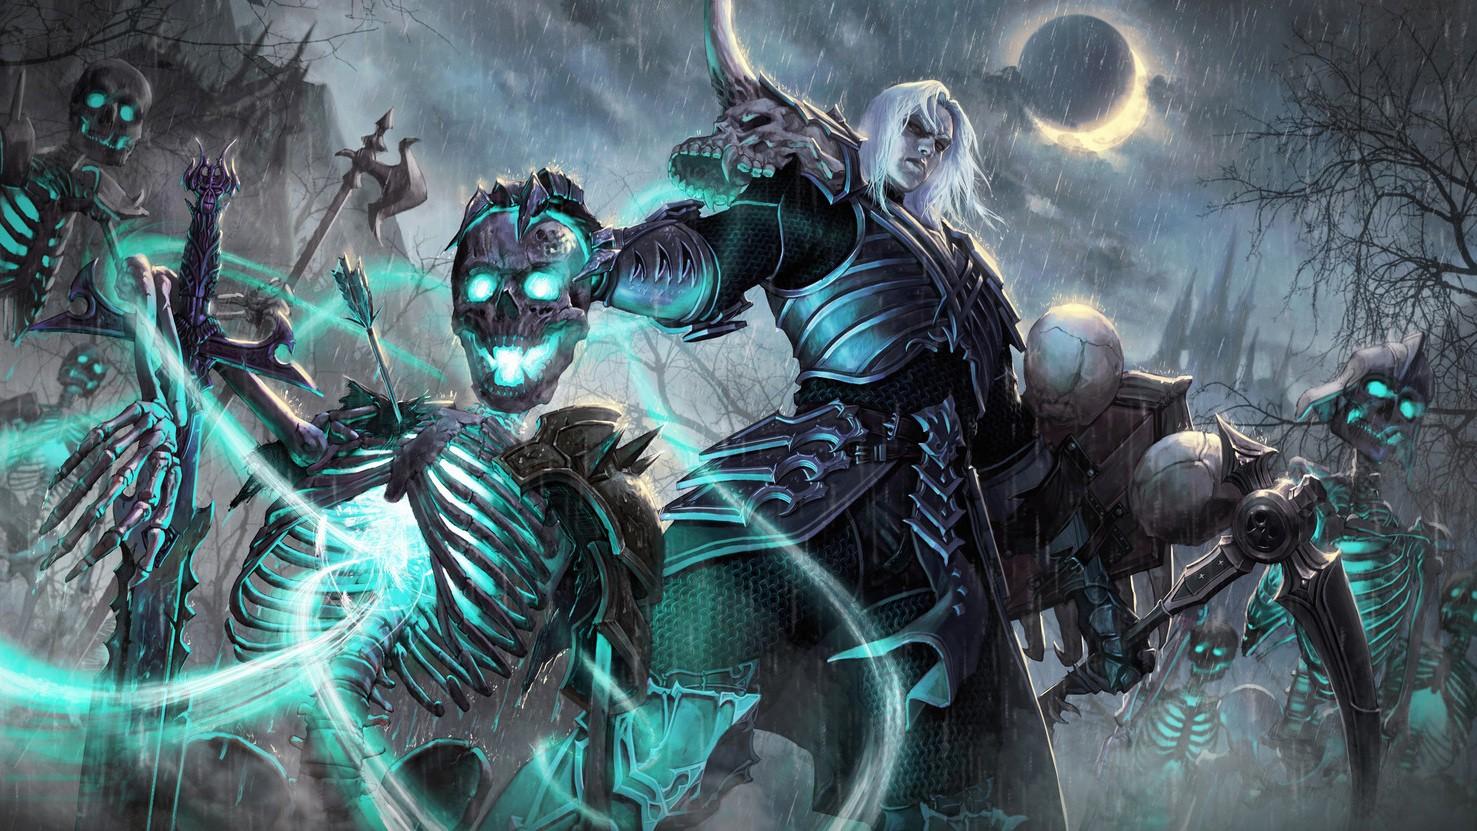 Blizzard в последний момент отказалась от анонса Diablo 4 на Blizzcon